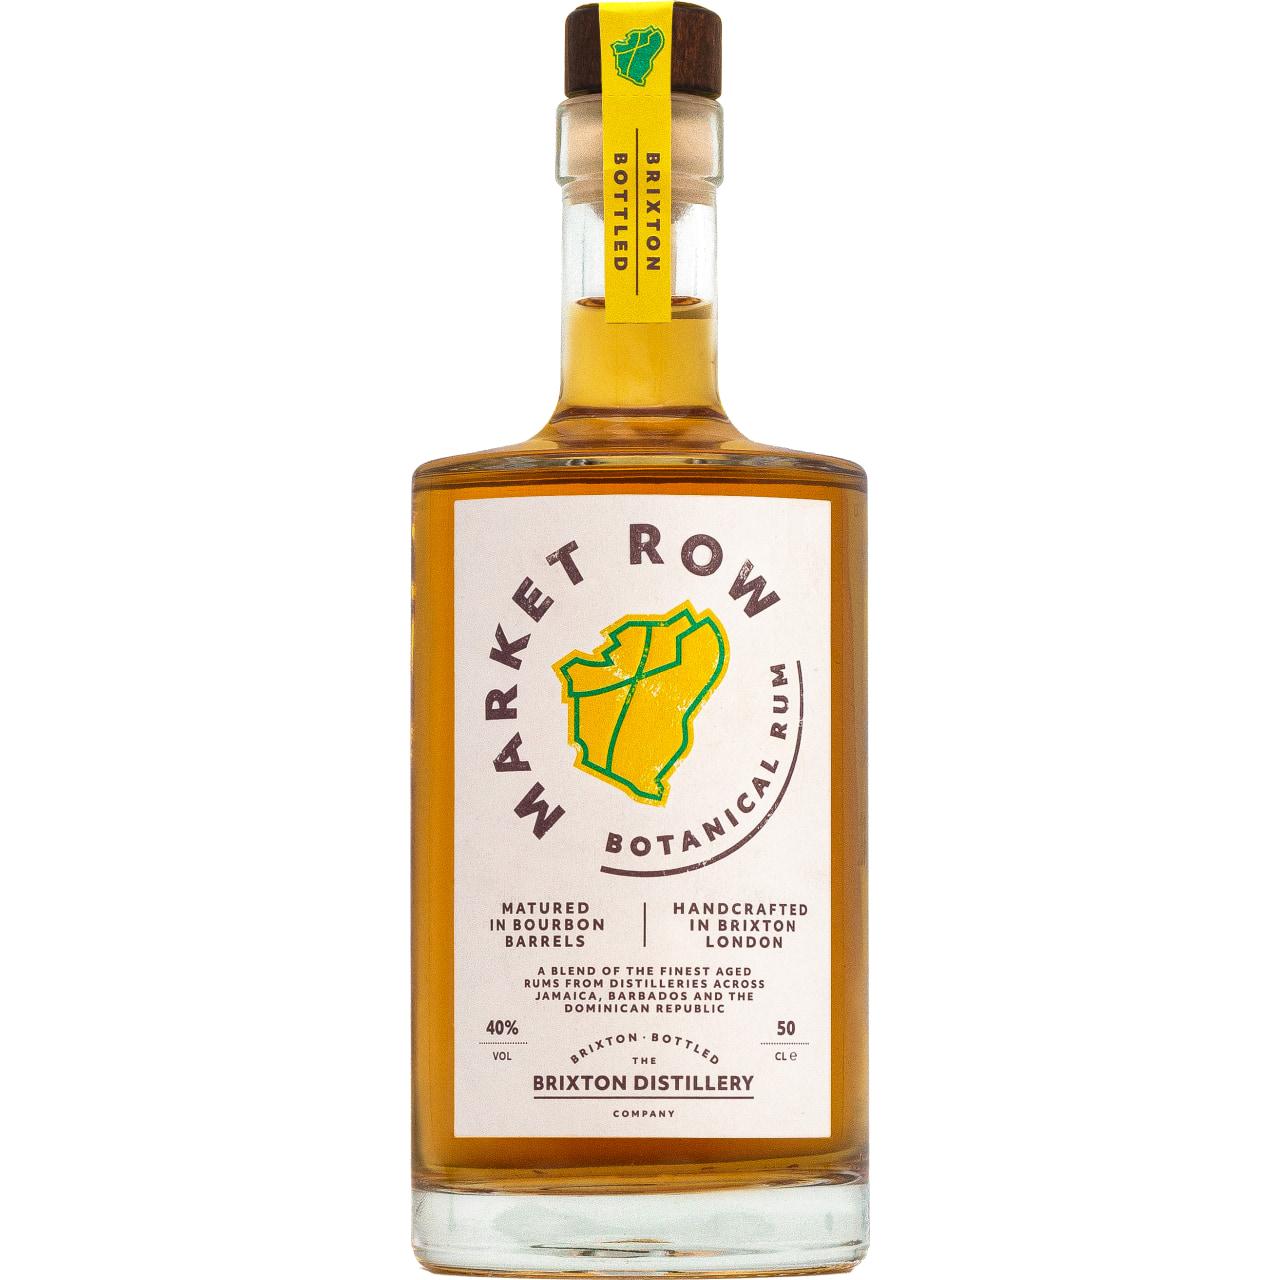 Market Row Botanical Rum